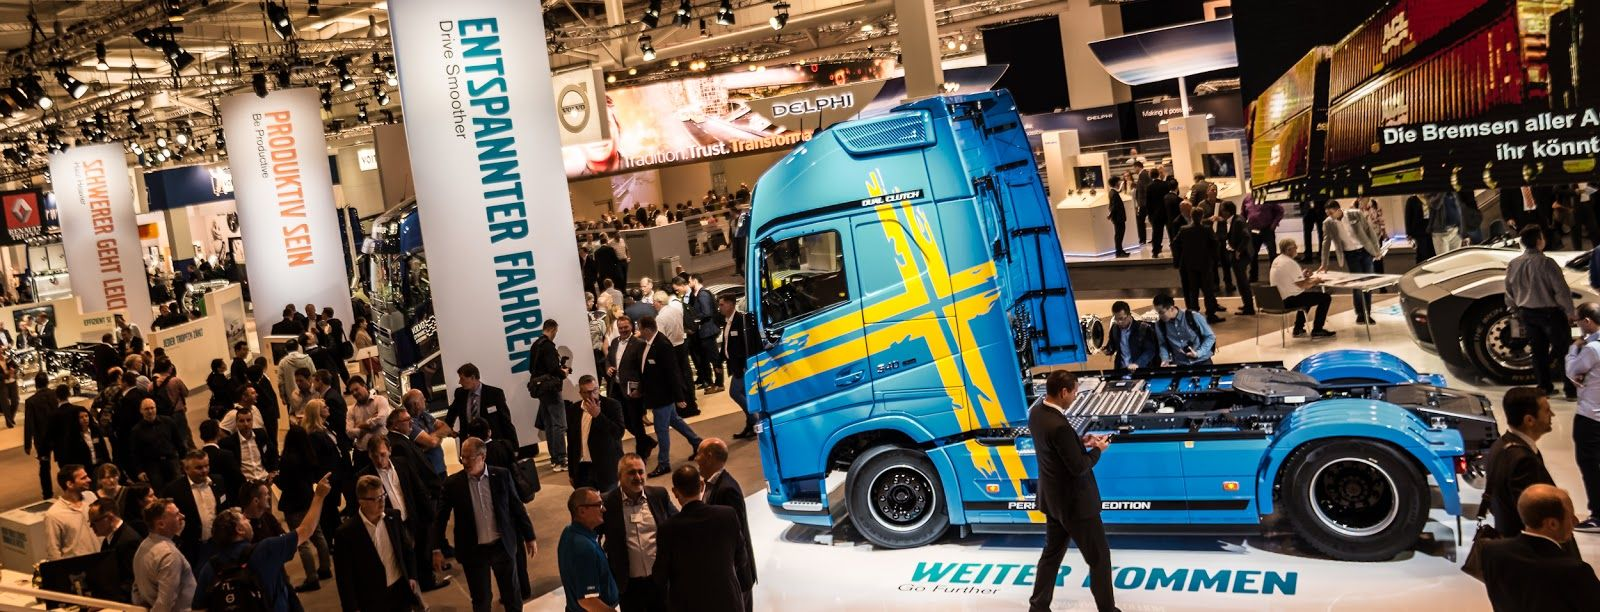 SCS Software на выставке IAA Commercial Vehicles 2016